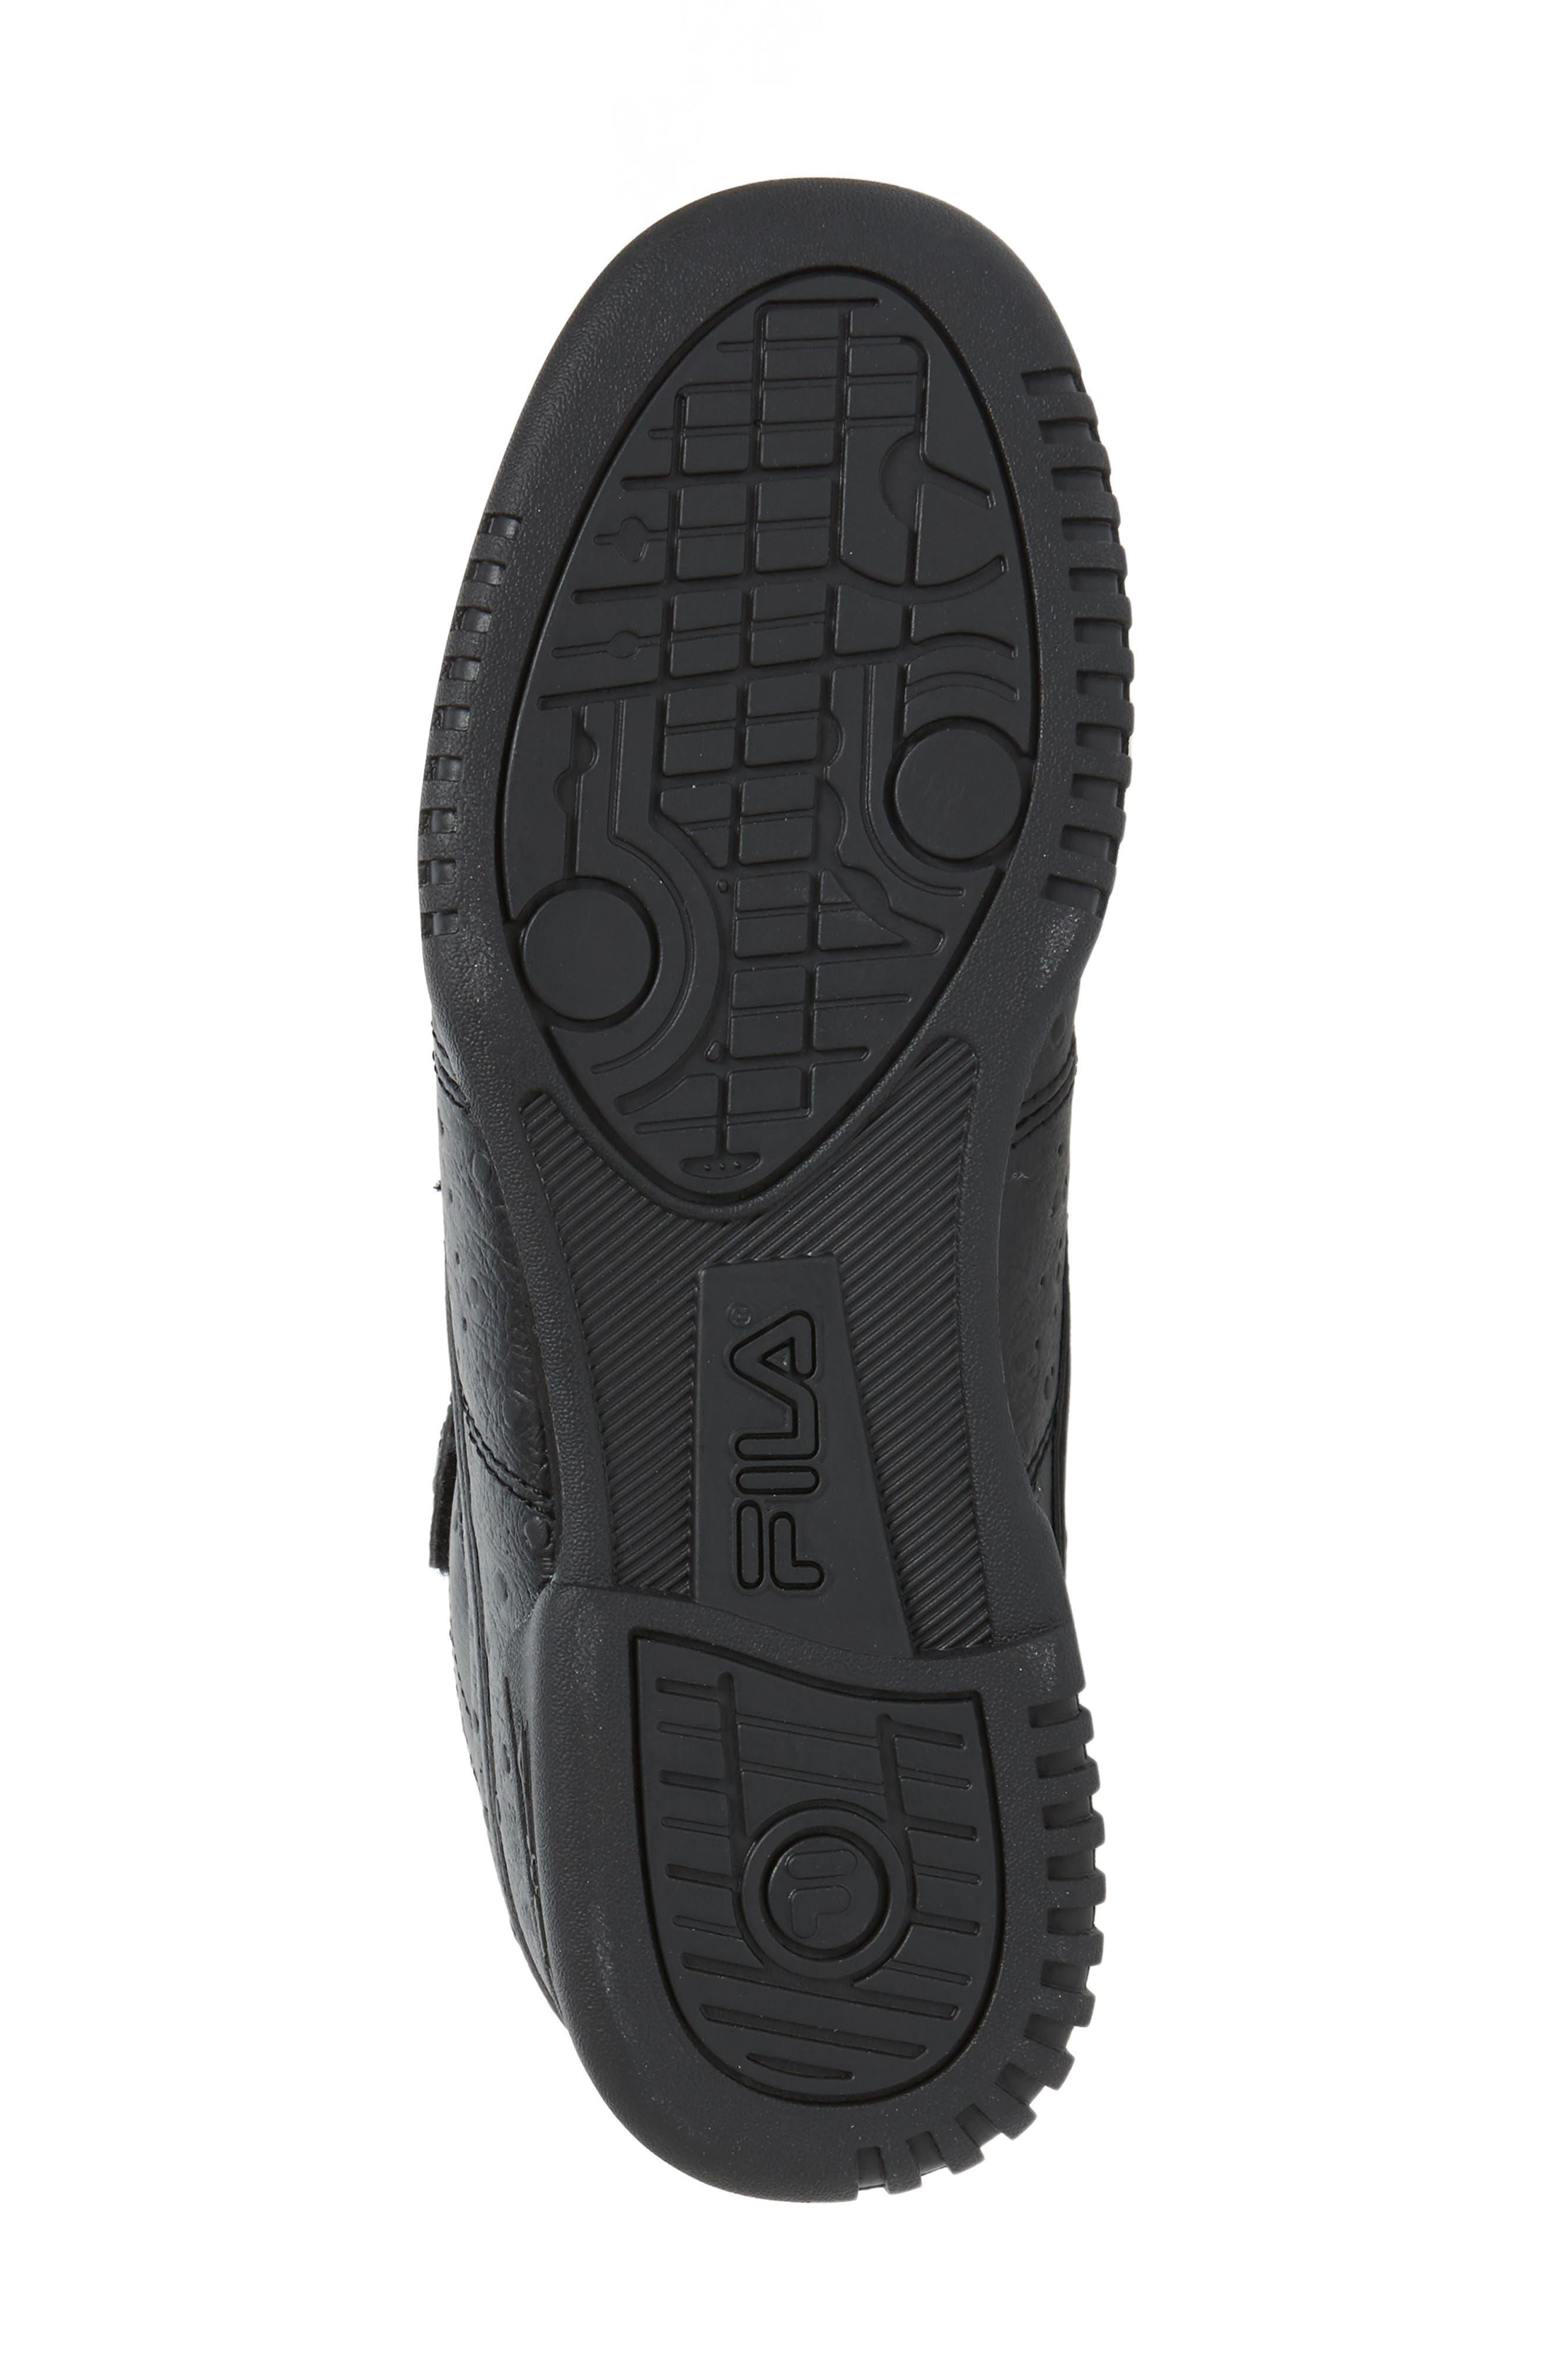 FILA, F-13 Ostrich Embossed High Top Sneaker, Alternate thumbnail 4, color, TRIPLE BLACK